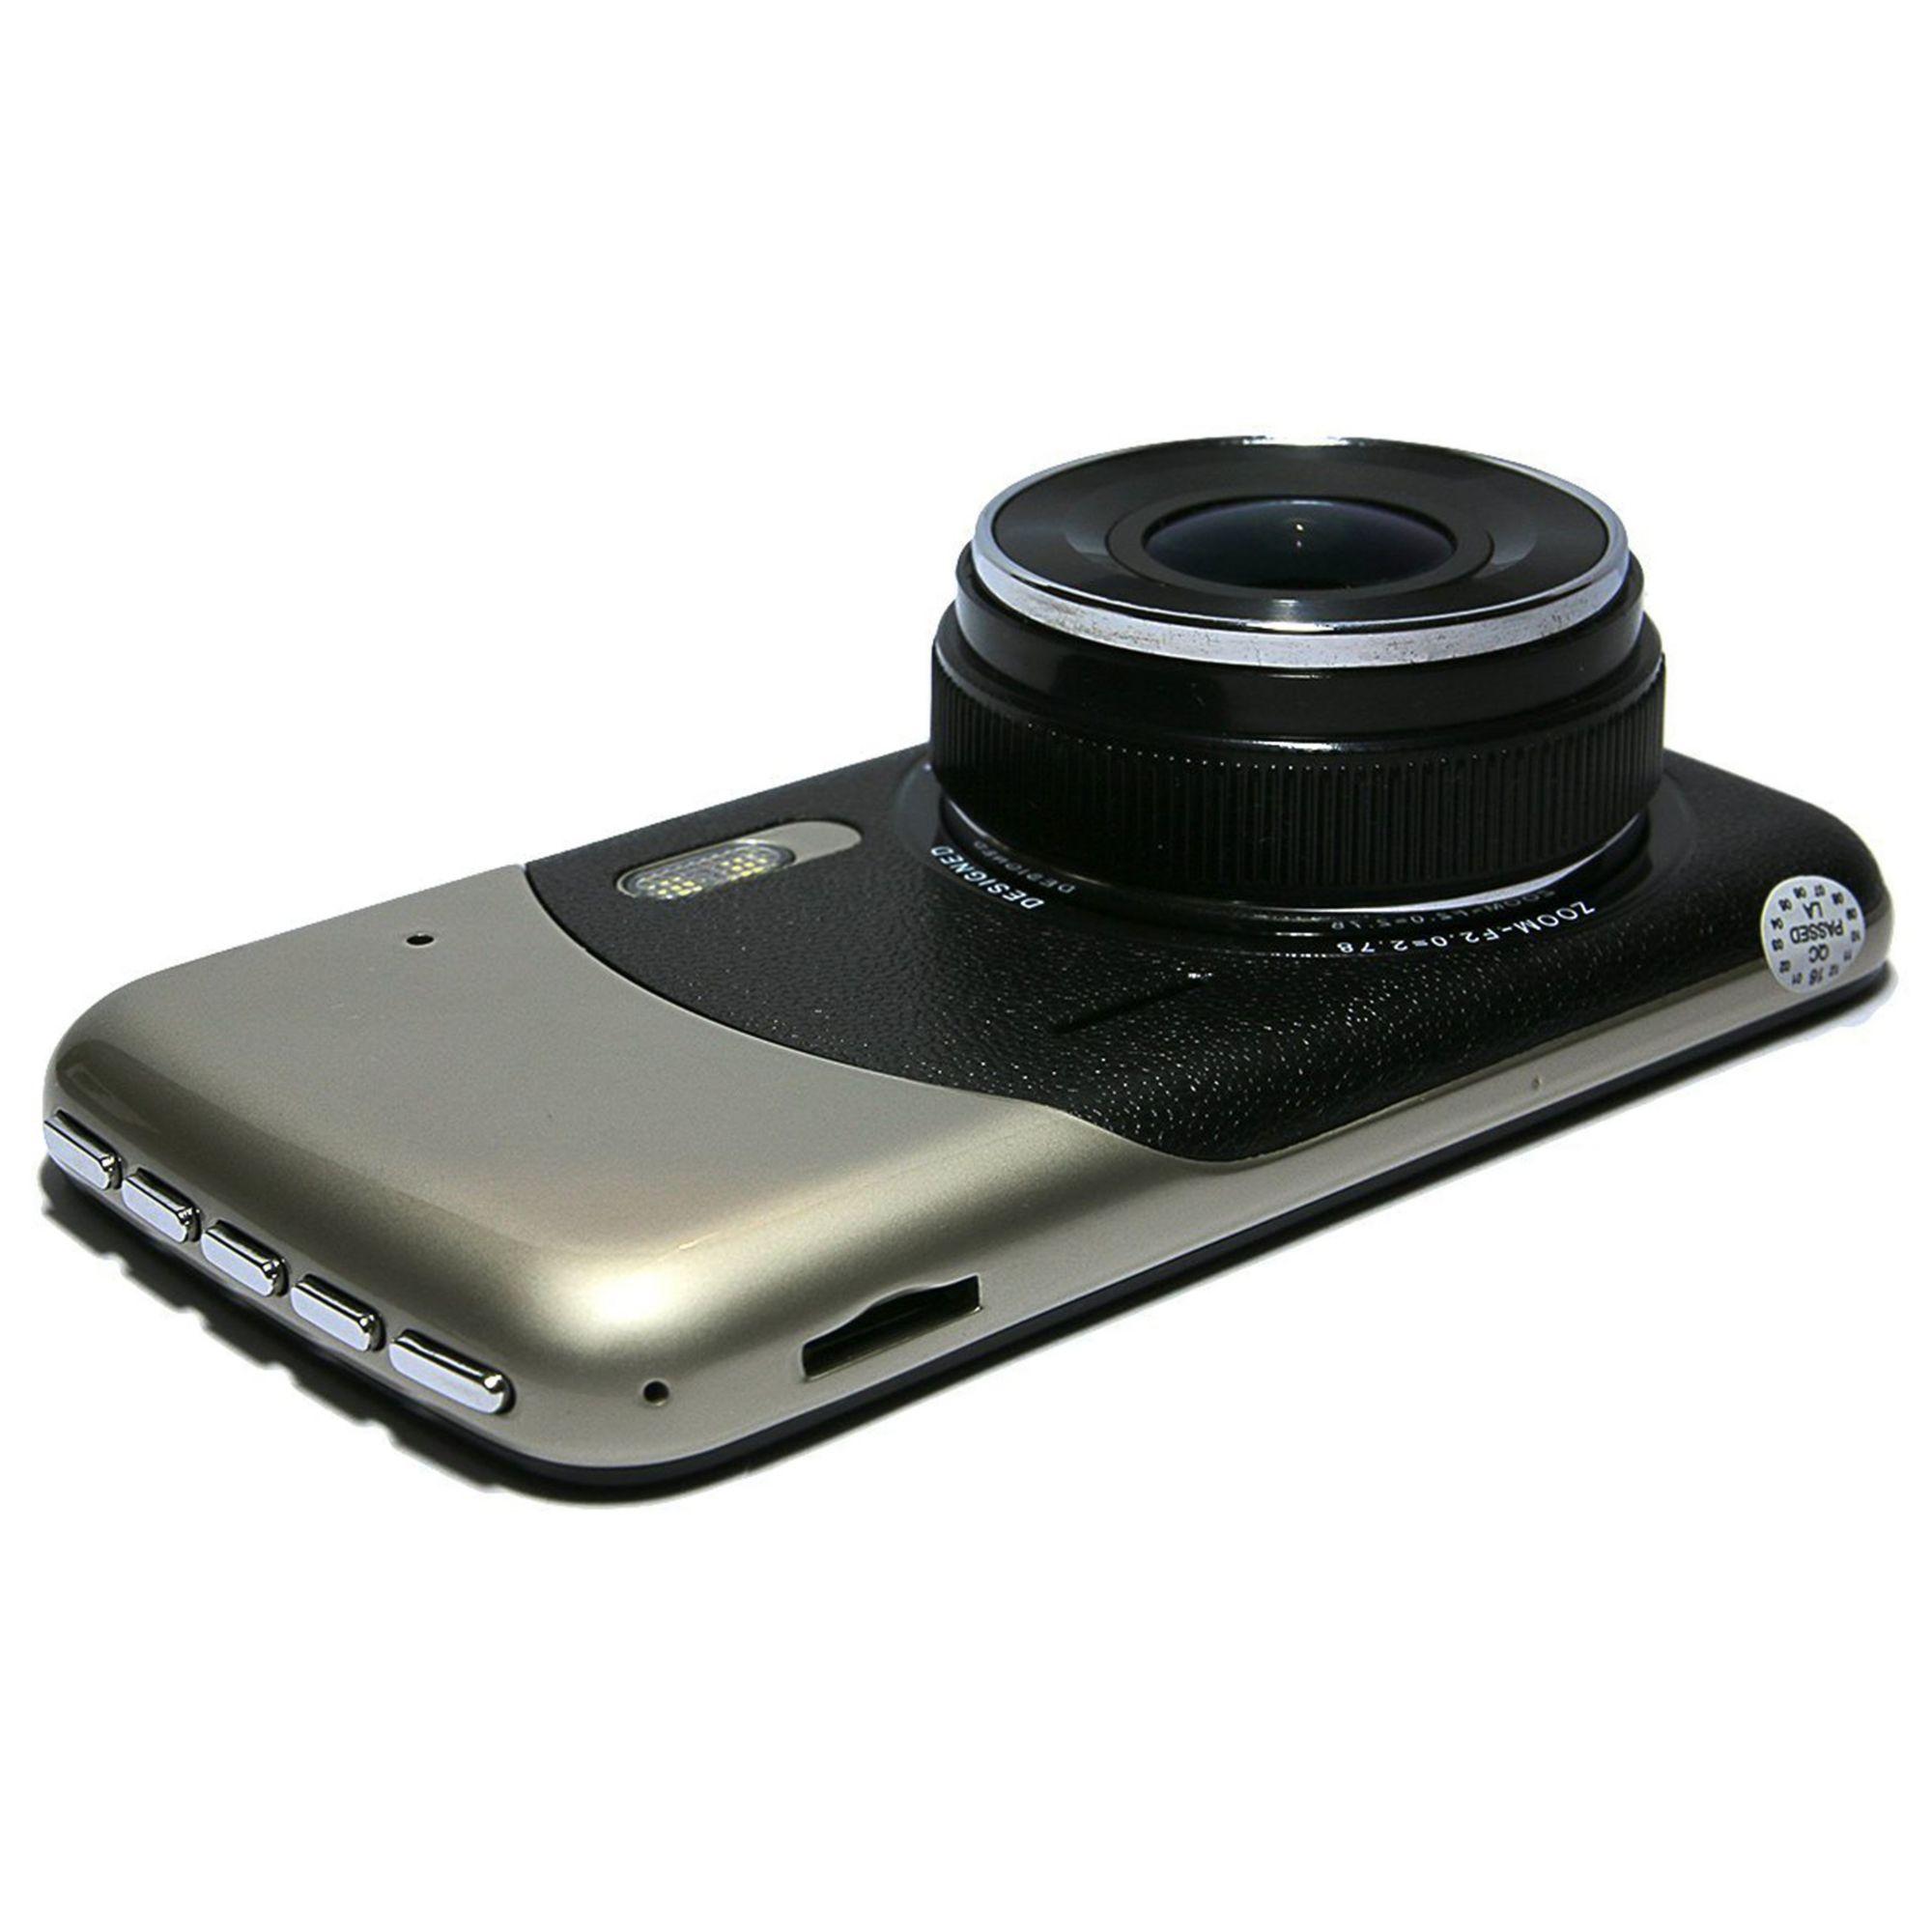 CREATONE Creatone Autokamera / Dashcam mit Full HD 1080p inkl. Rückfahrkamera »DVR5000FHD«